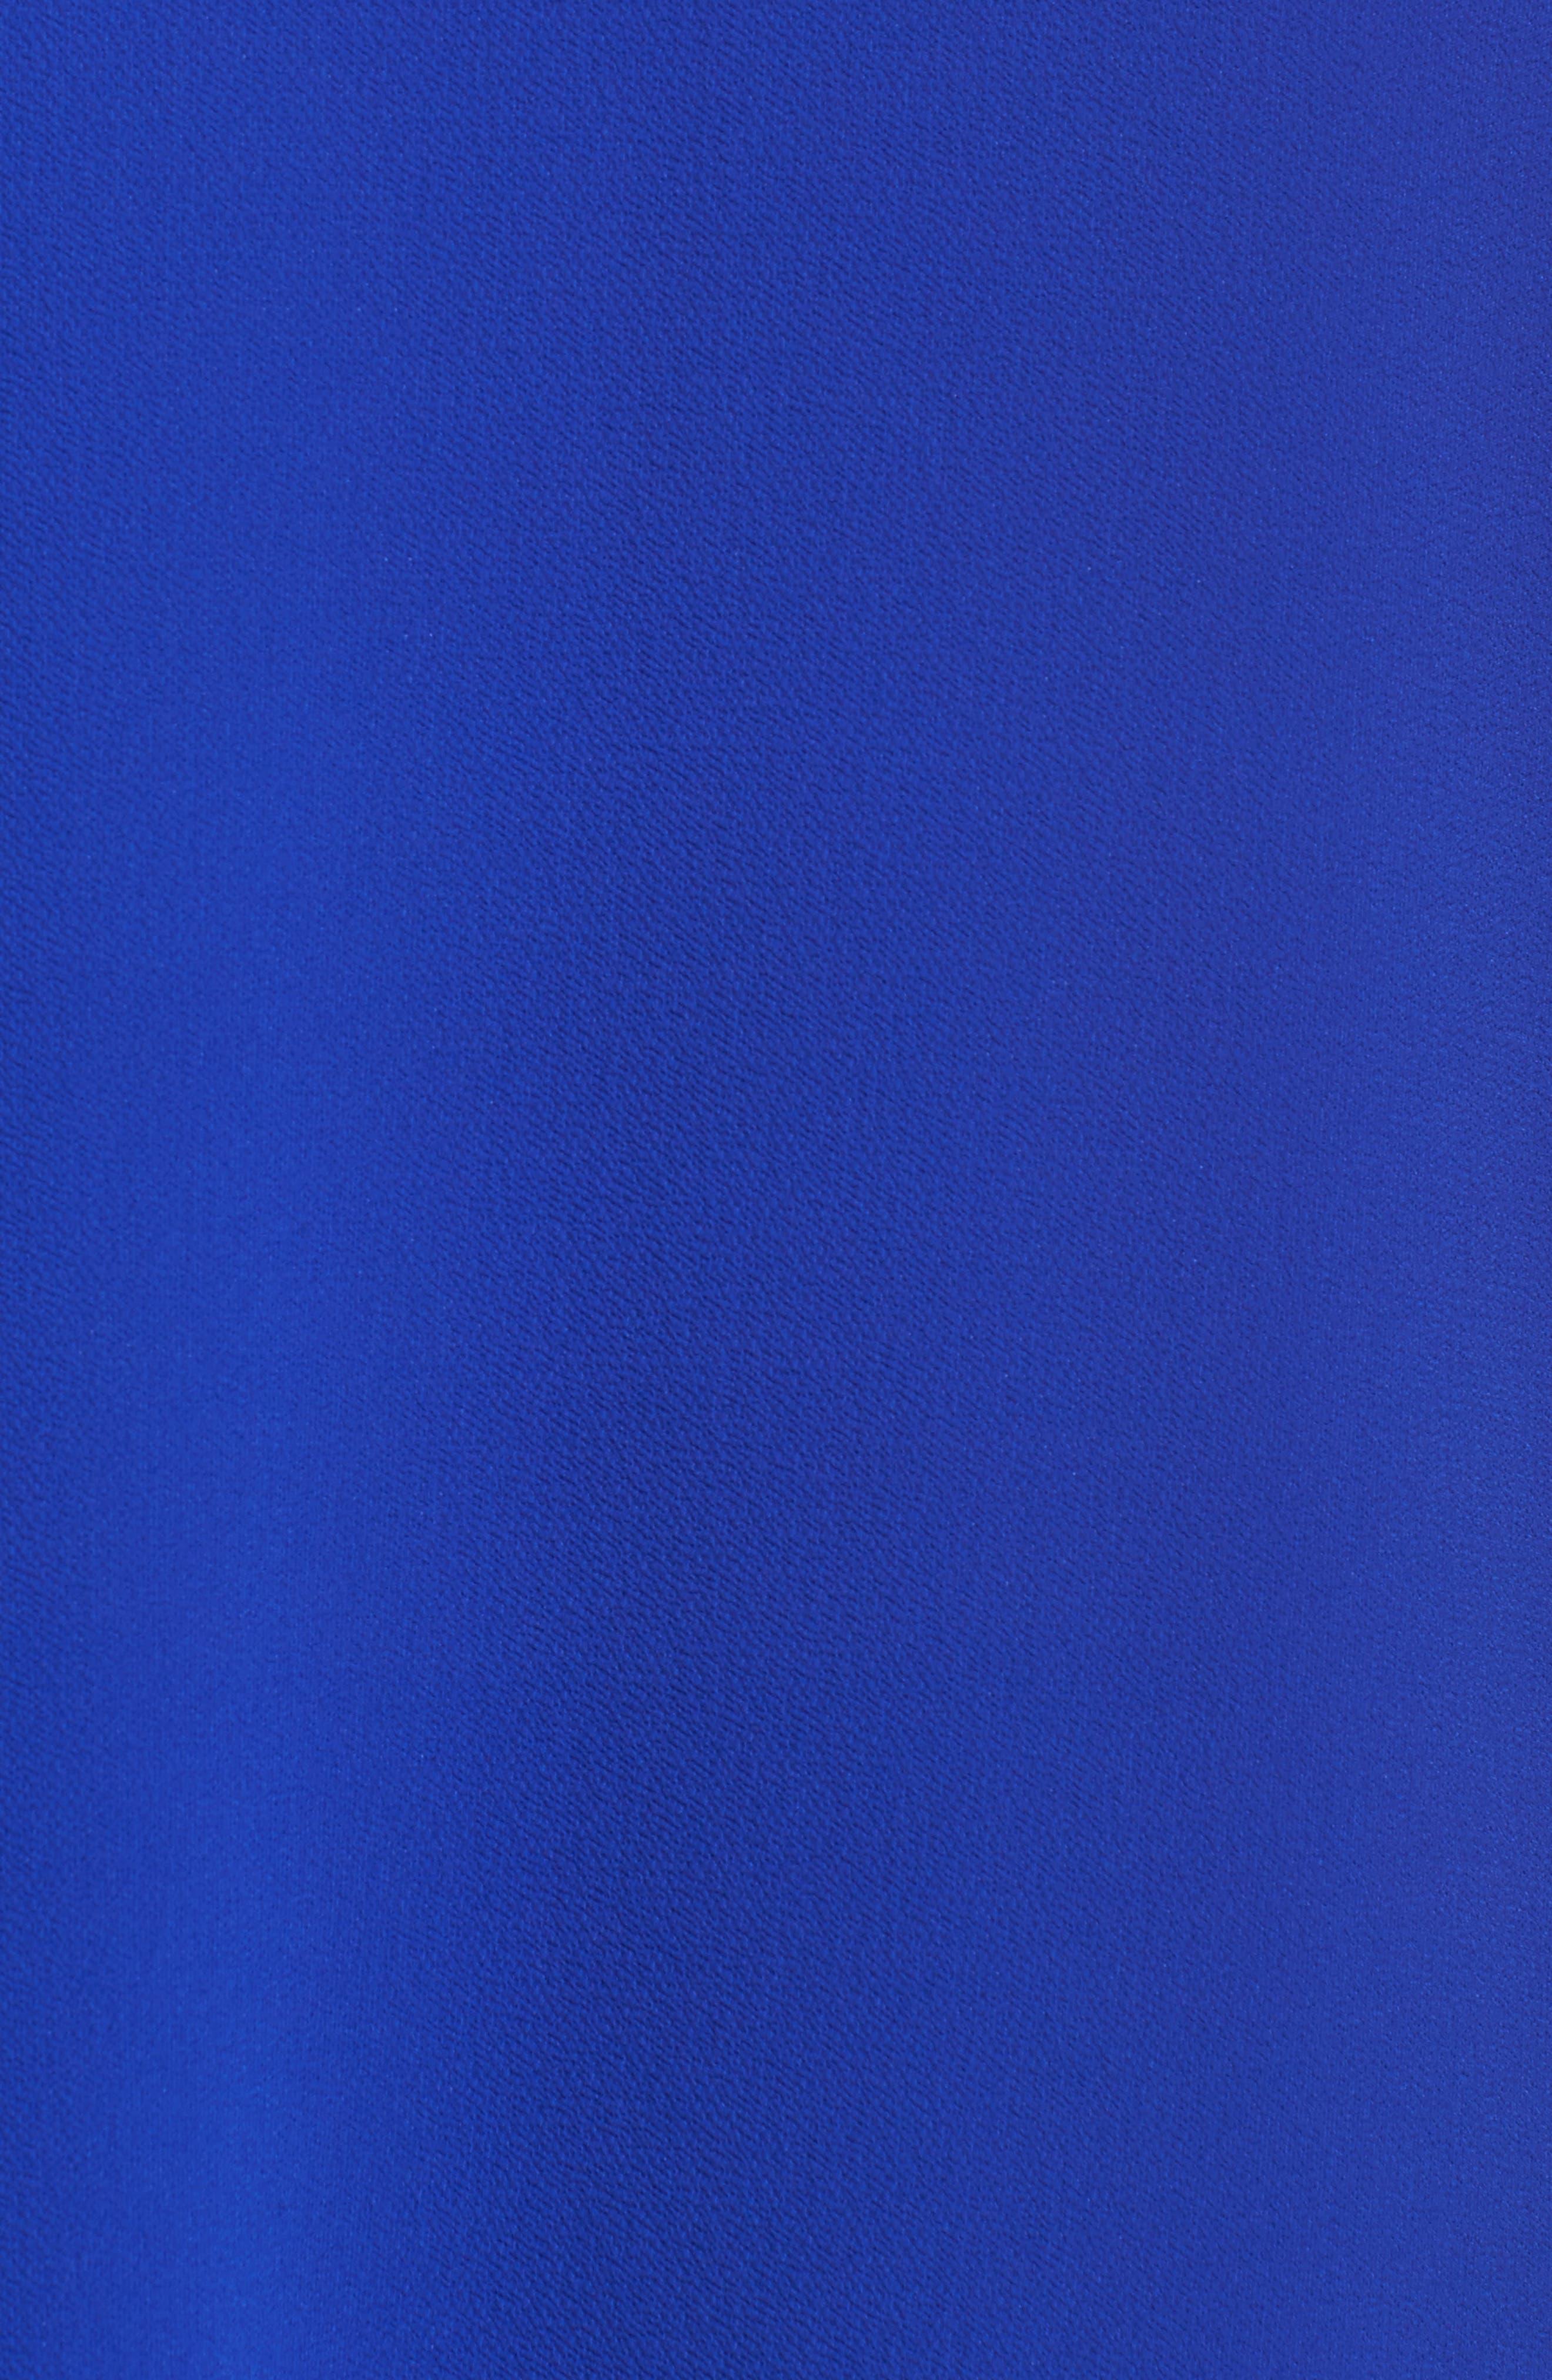 Bell Sleeve Cold Shoulder Blouse,                             Alternate thumbnail 5, color,                             457